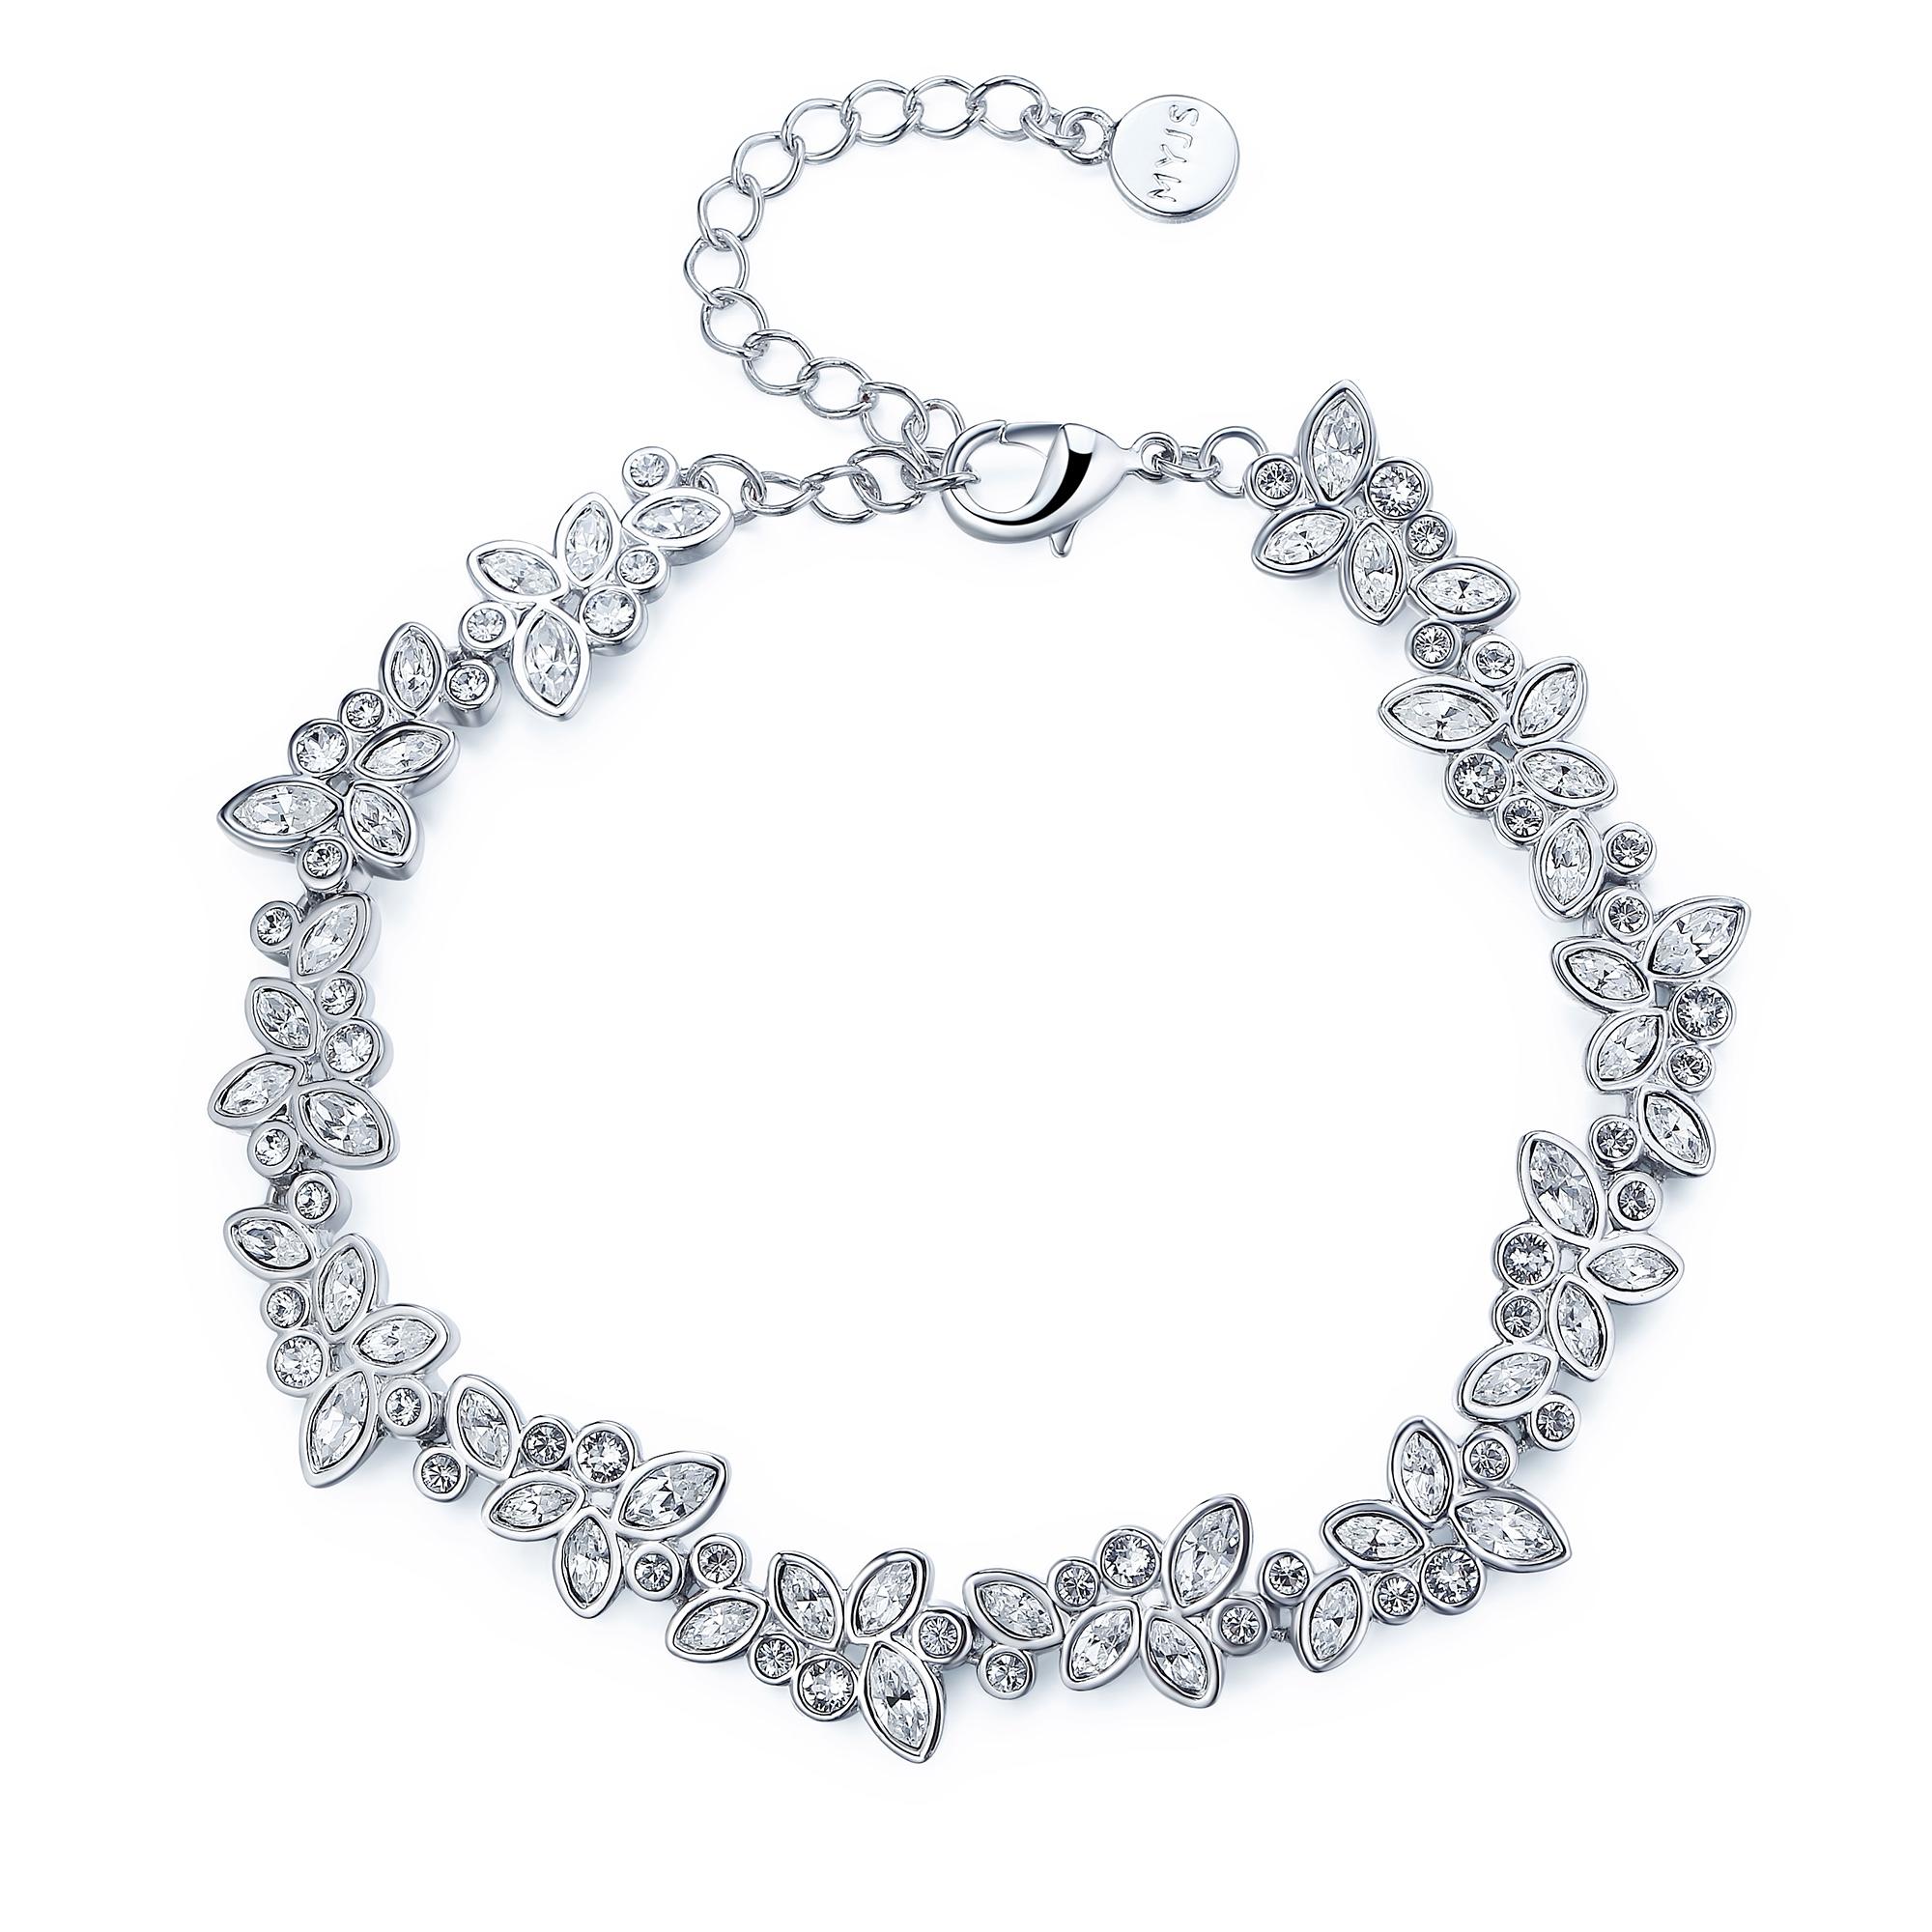 4622a6e6cb483 Details about Diapason Enchanted Bracelet with Swarovski Crystals WGP MYJS